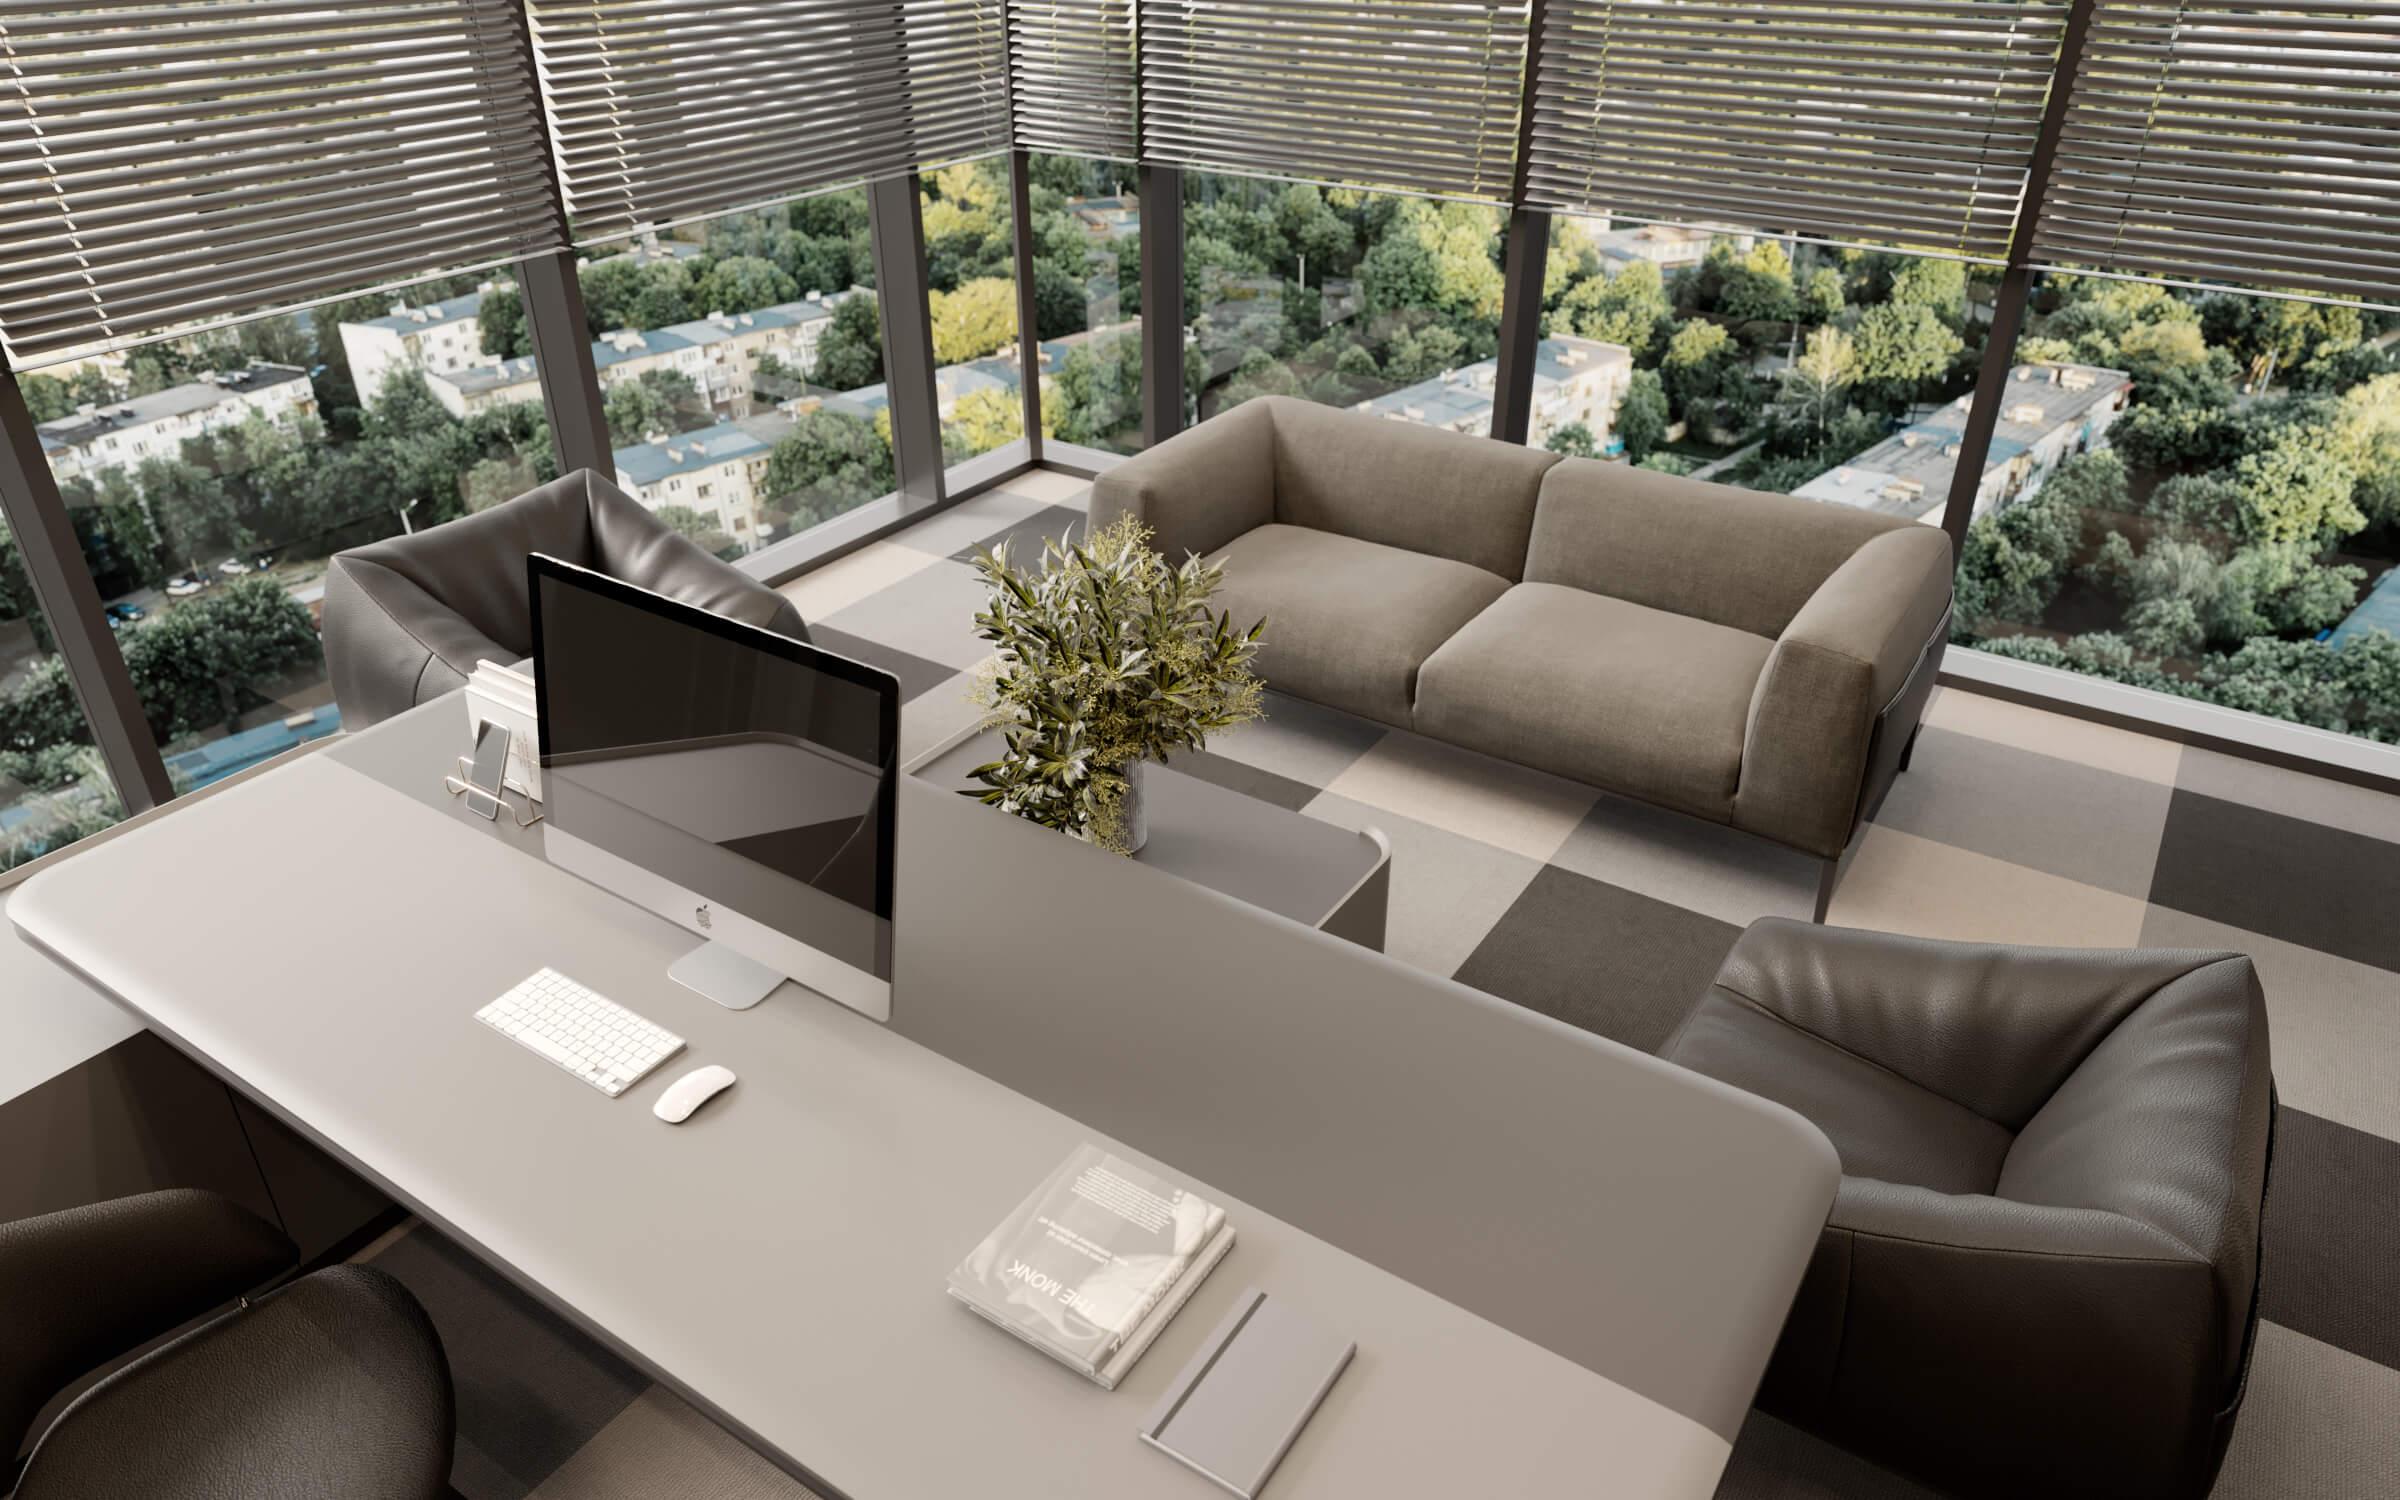 ofis içmimari 4116 Anadolu Hayat Emeklilik Ofisler